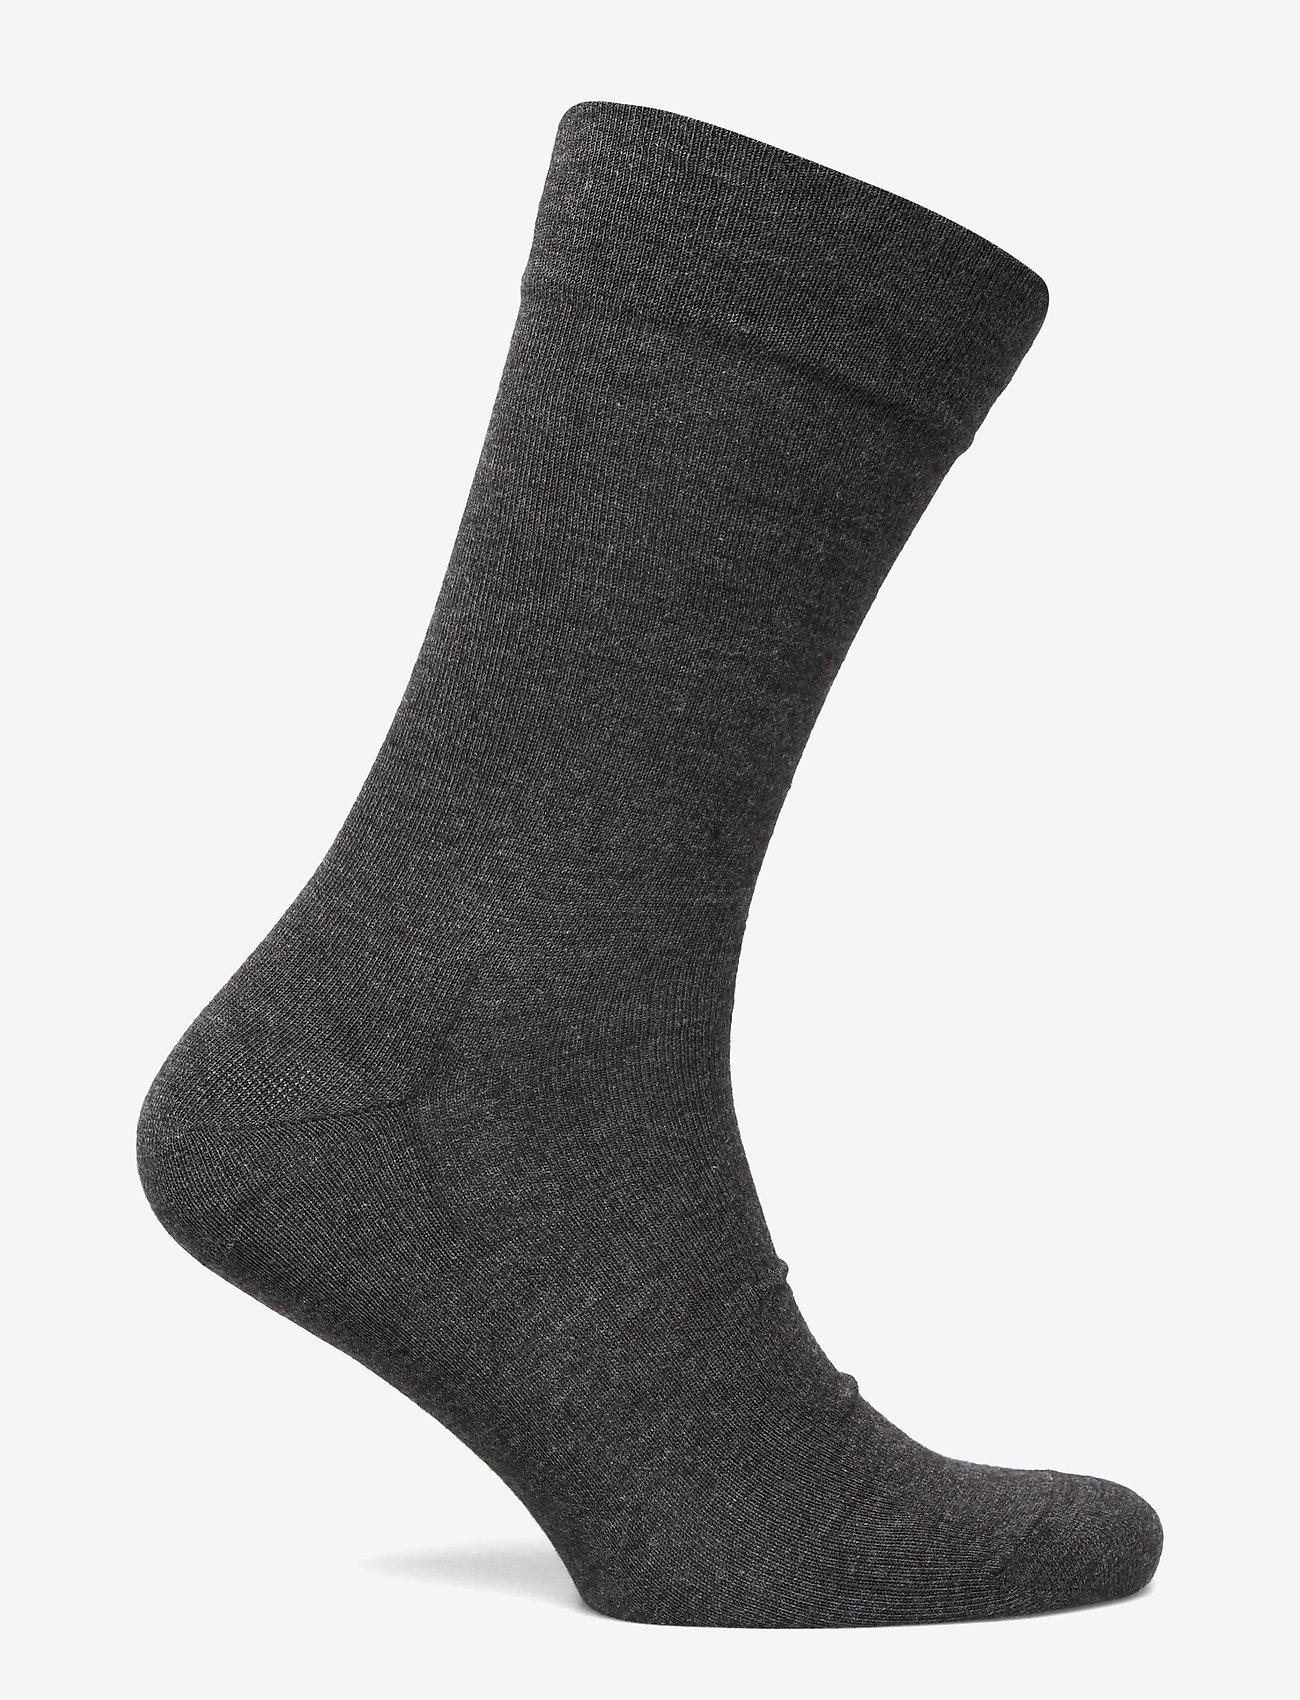 Egtved - Egtved socks bamboo no elastic - regular socks - grey